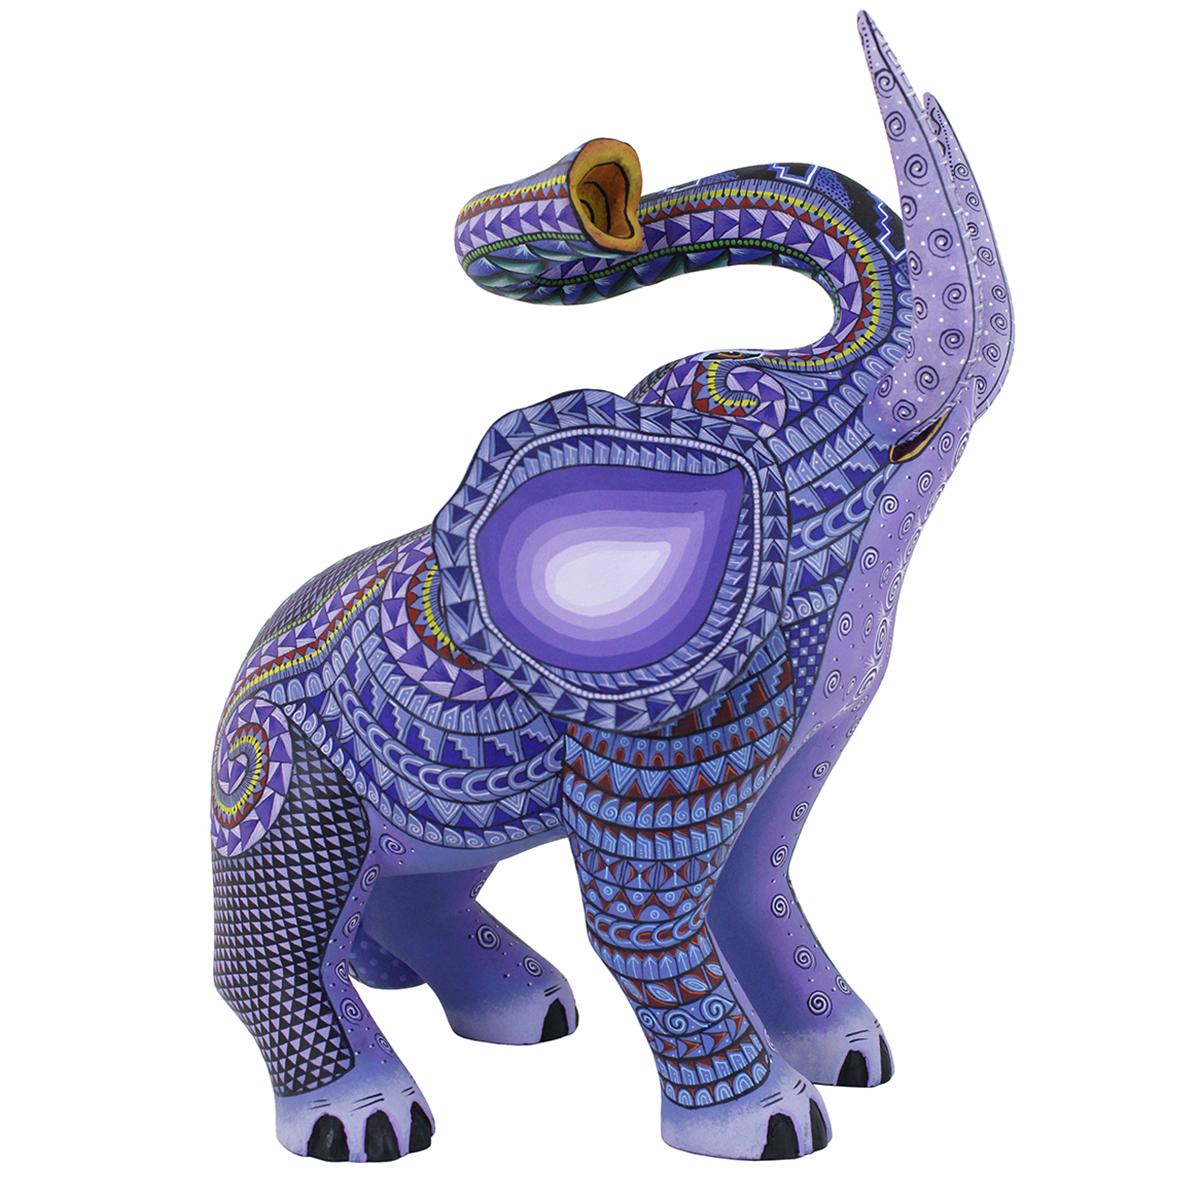 Eduardo Fabian Eduardo Fabian & Elvis Canseco: Large Single Piece Elephant Elephant